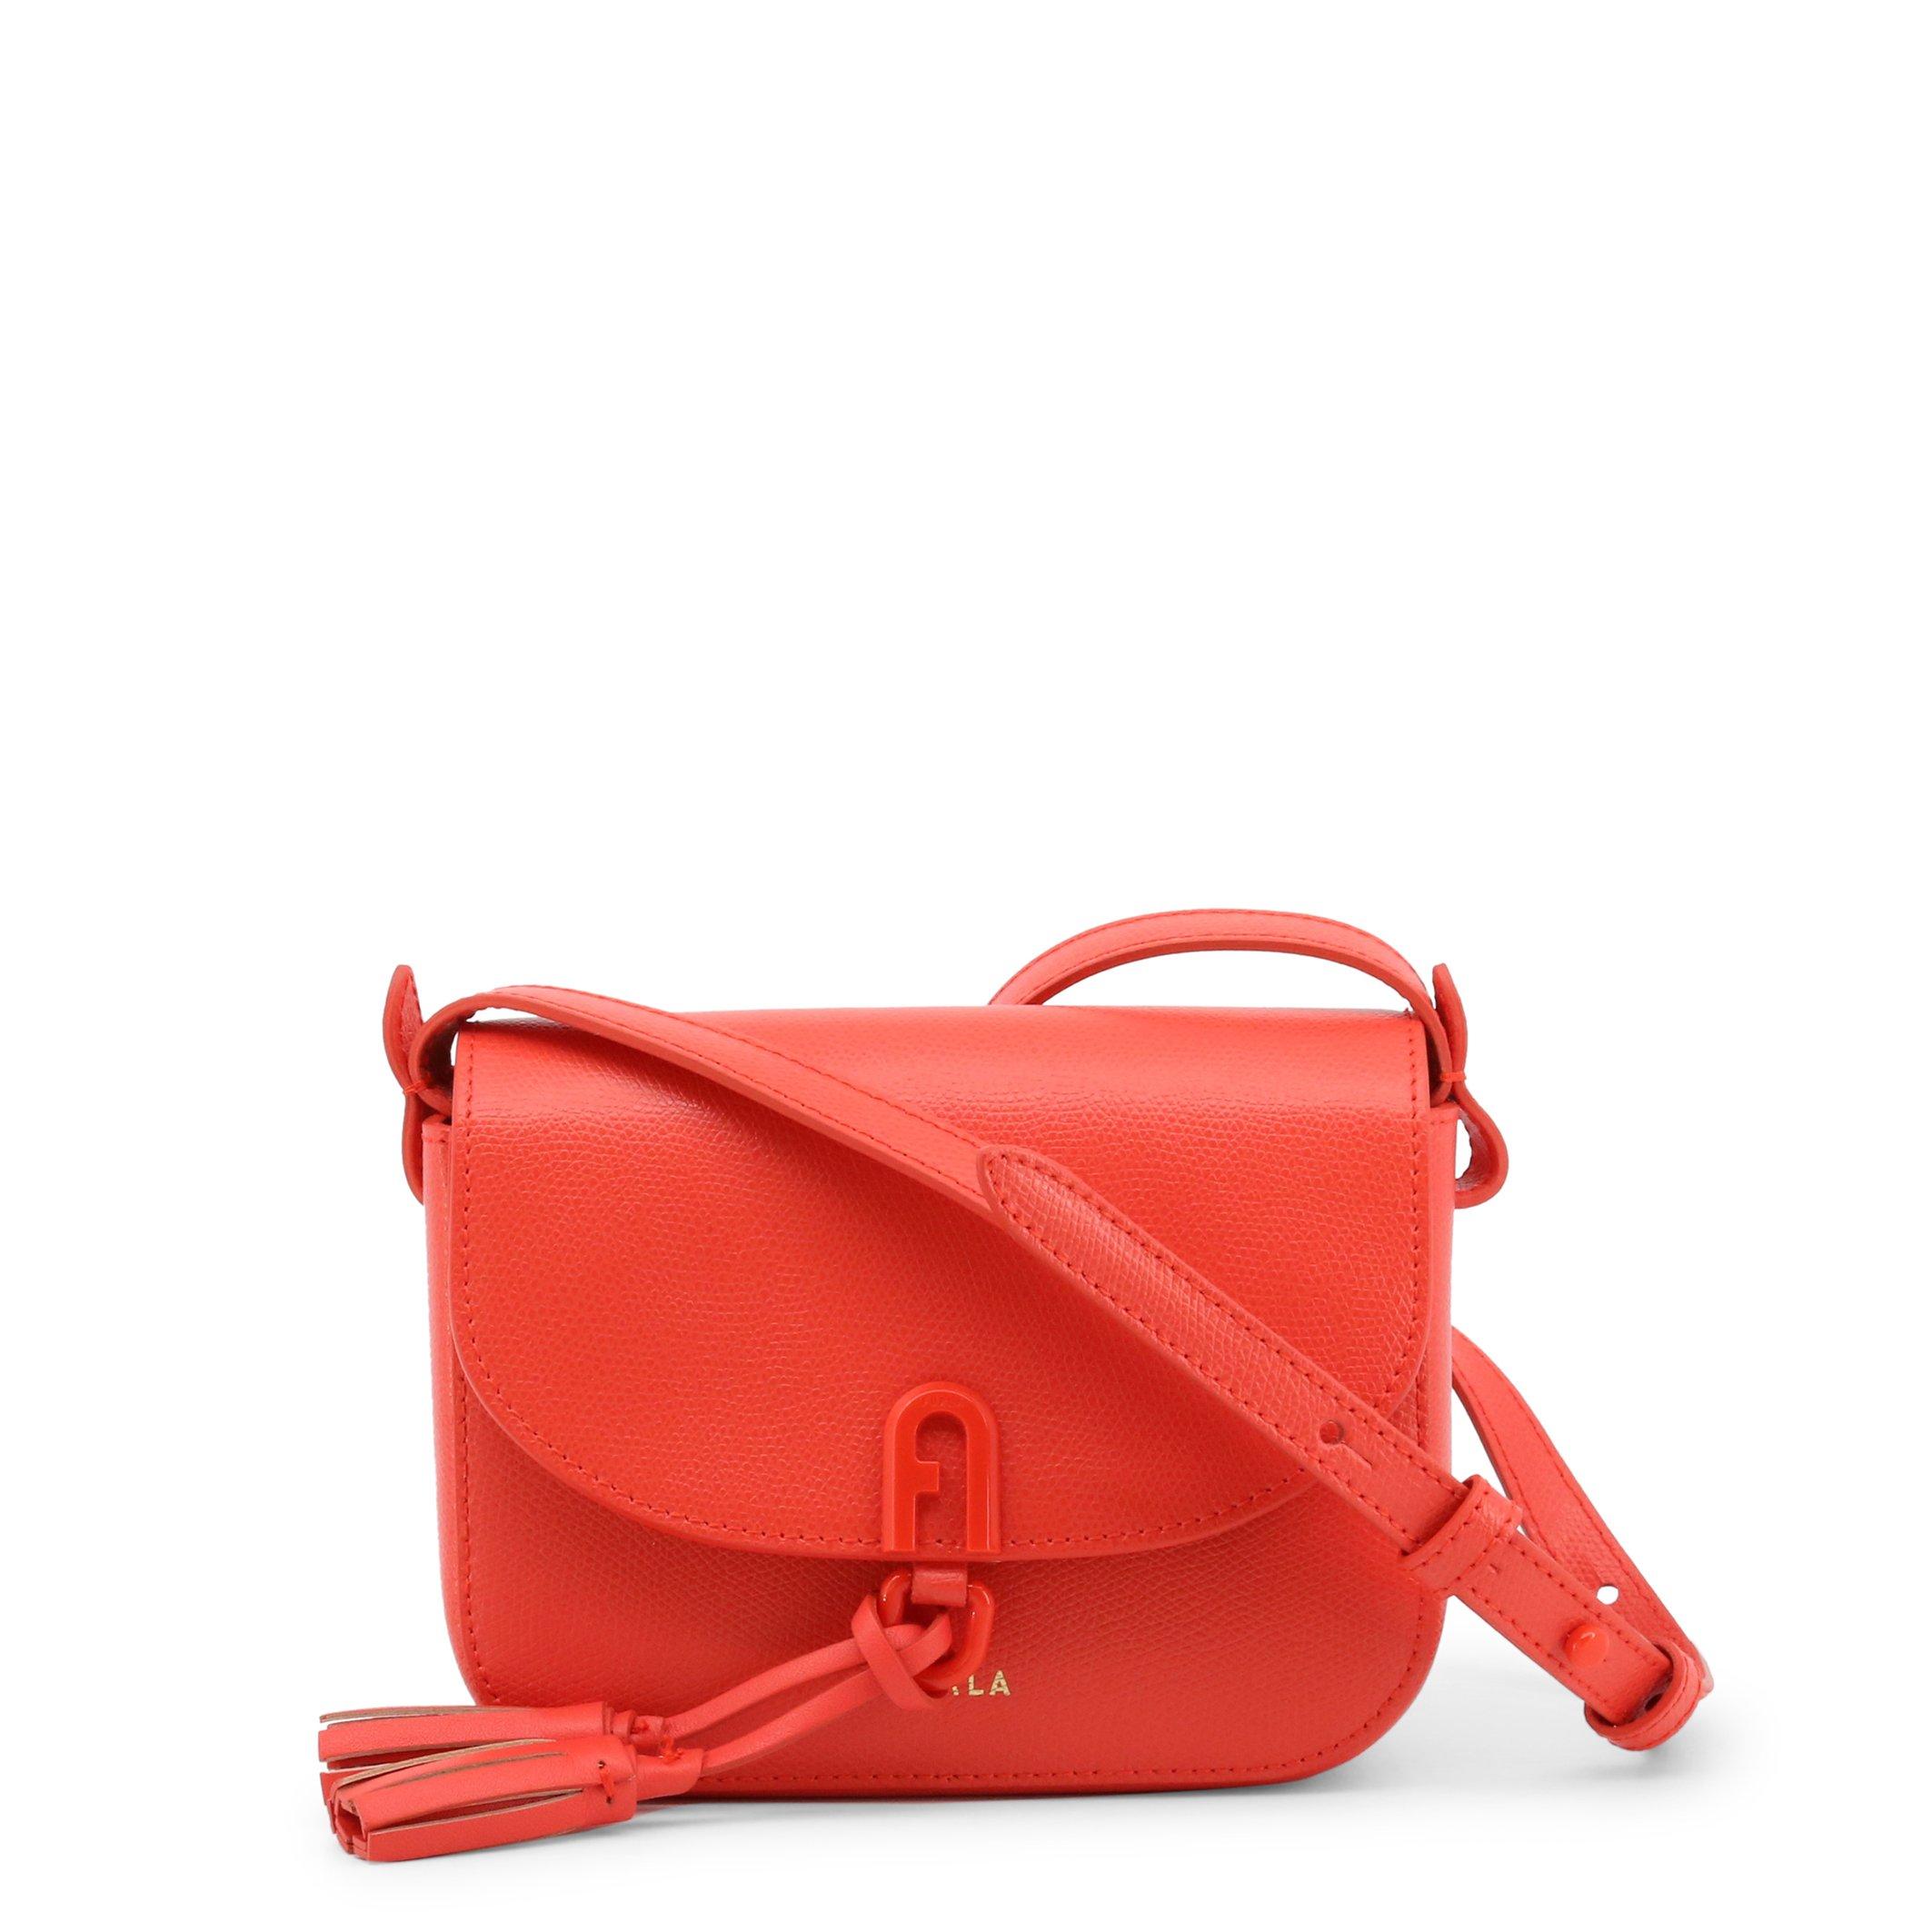 Furla Women's Crossbody Bag Various Colours FURLA-1927_FRANGIA - red NOSIZE